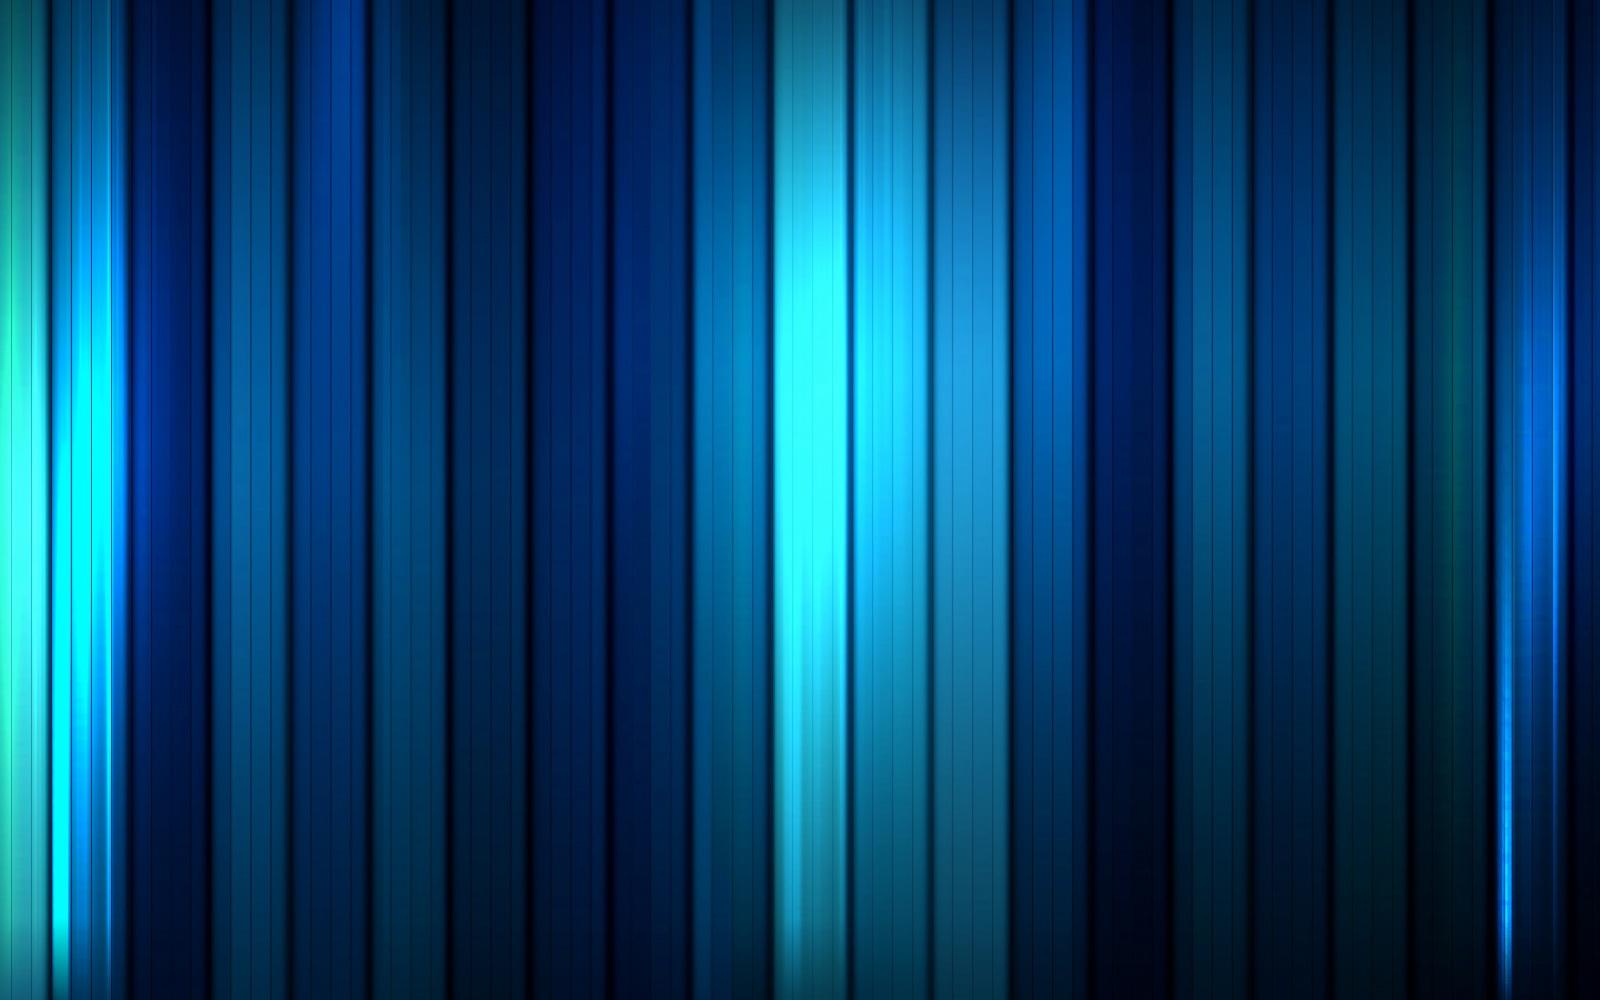 Smiley Full Hd Wallpaper And Achtergrond: Xavi Is Blog's: Blauwe Achtergronden